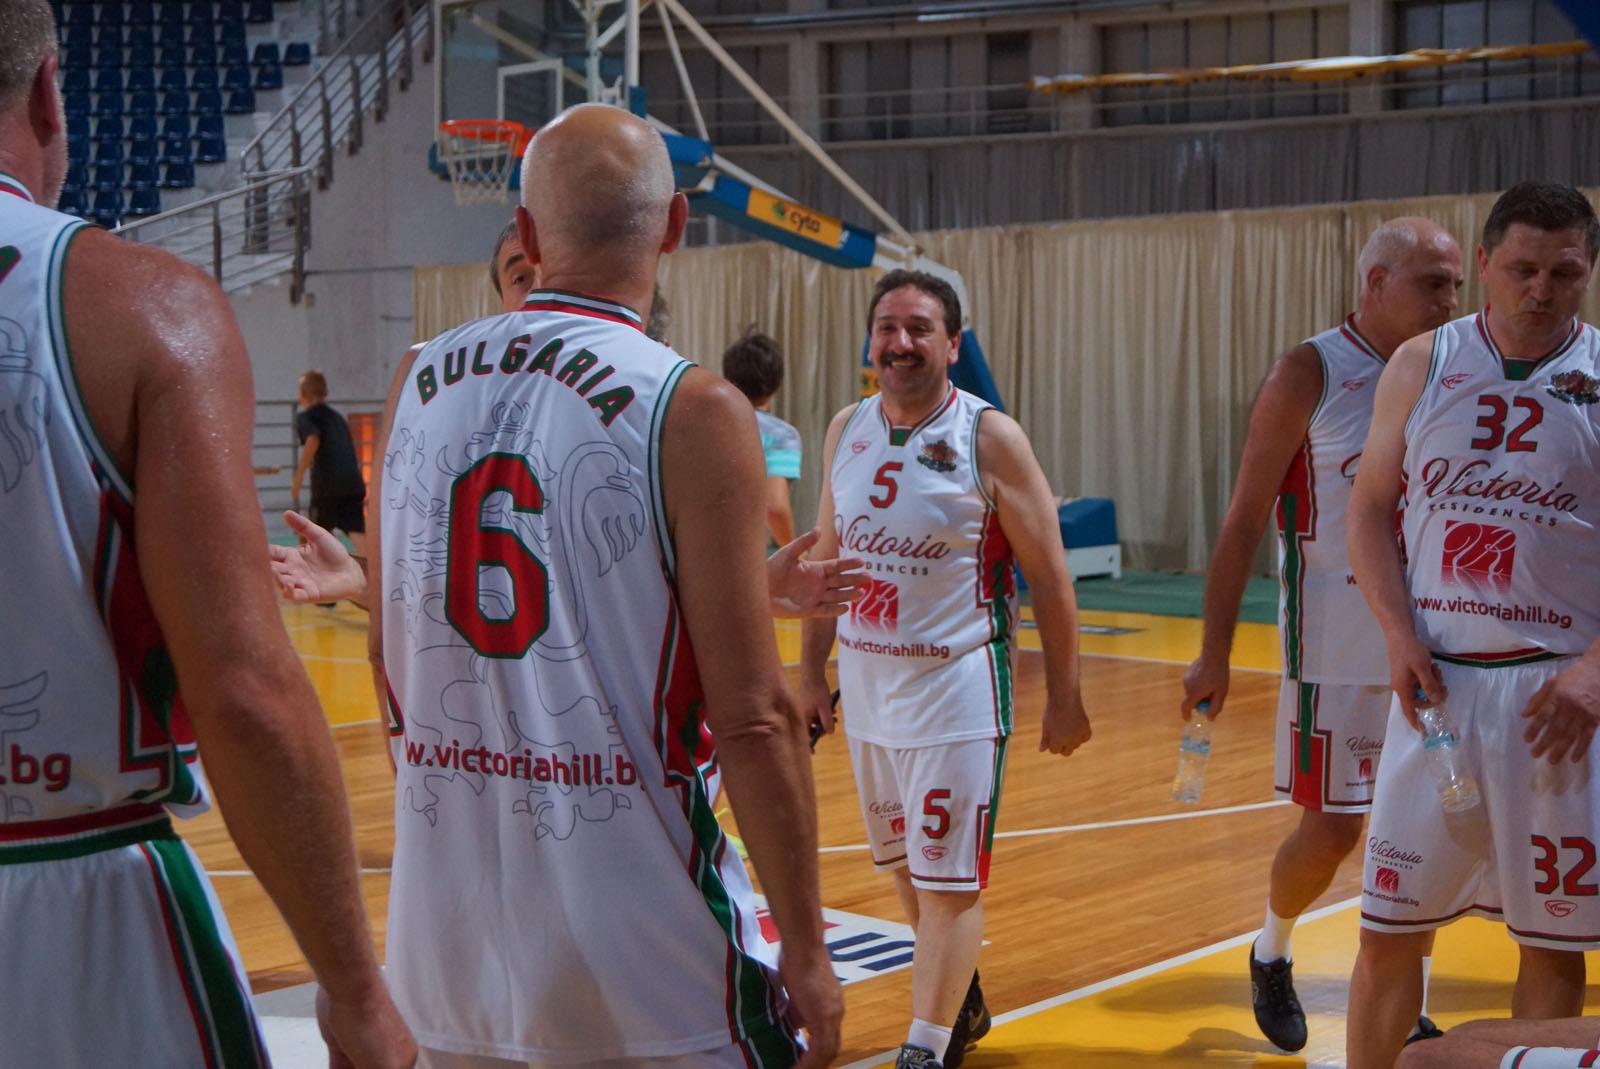 ALEXANDRION 1 | 45+M | BULGARIA - 45 AÑOS CHILE